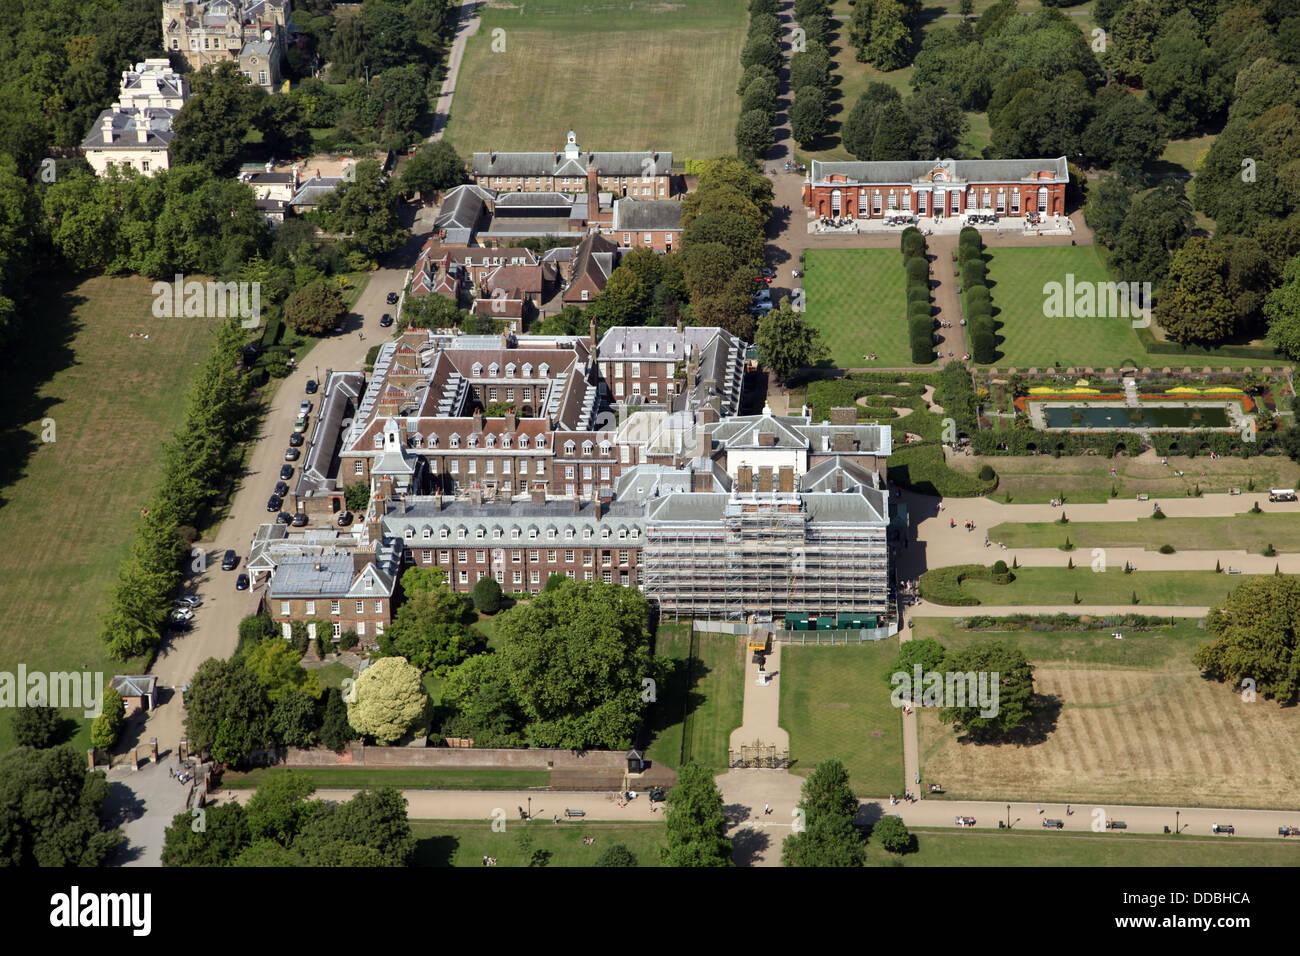 Kensington Palace Floor Plan Aerial View Of Kensington Palace In London Home Of Prince